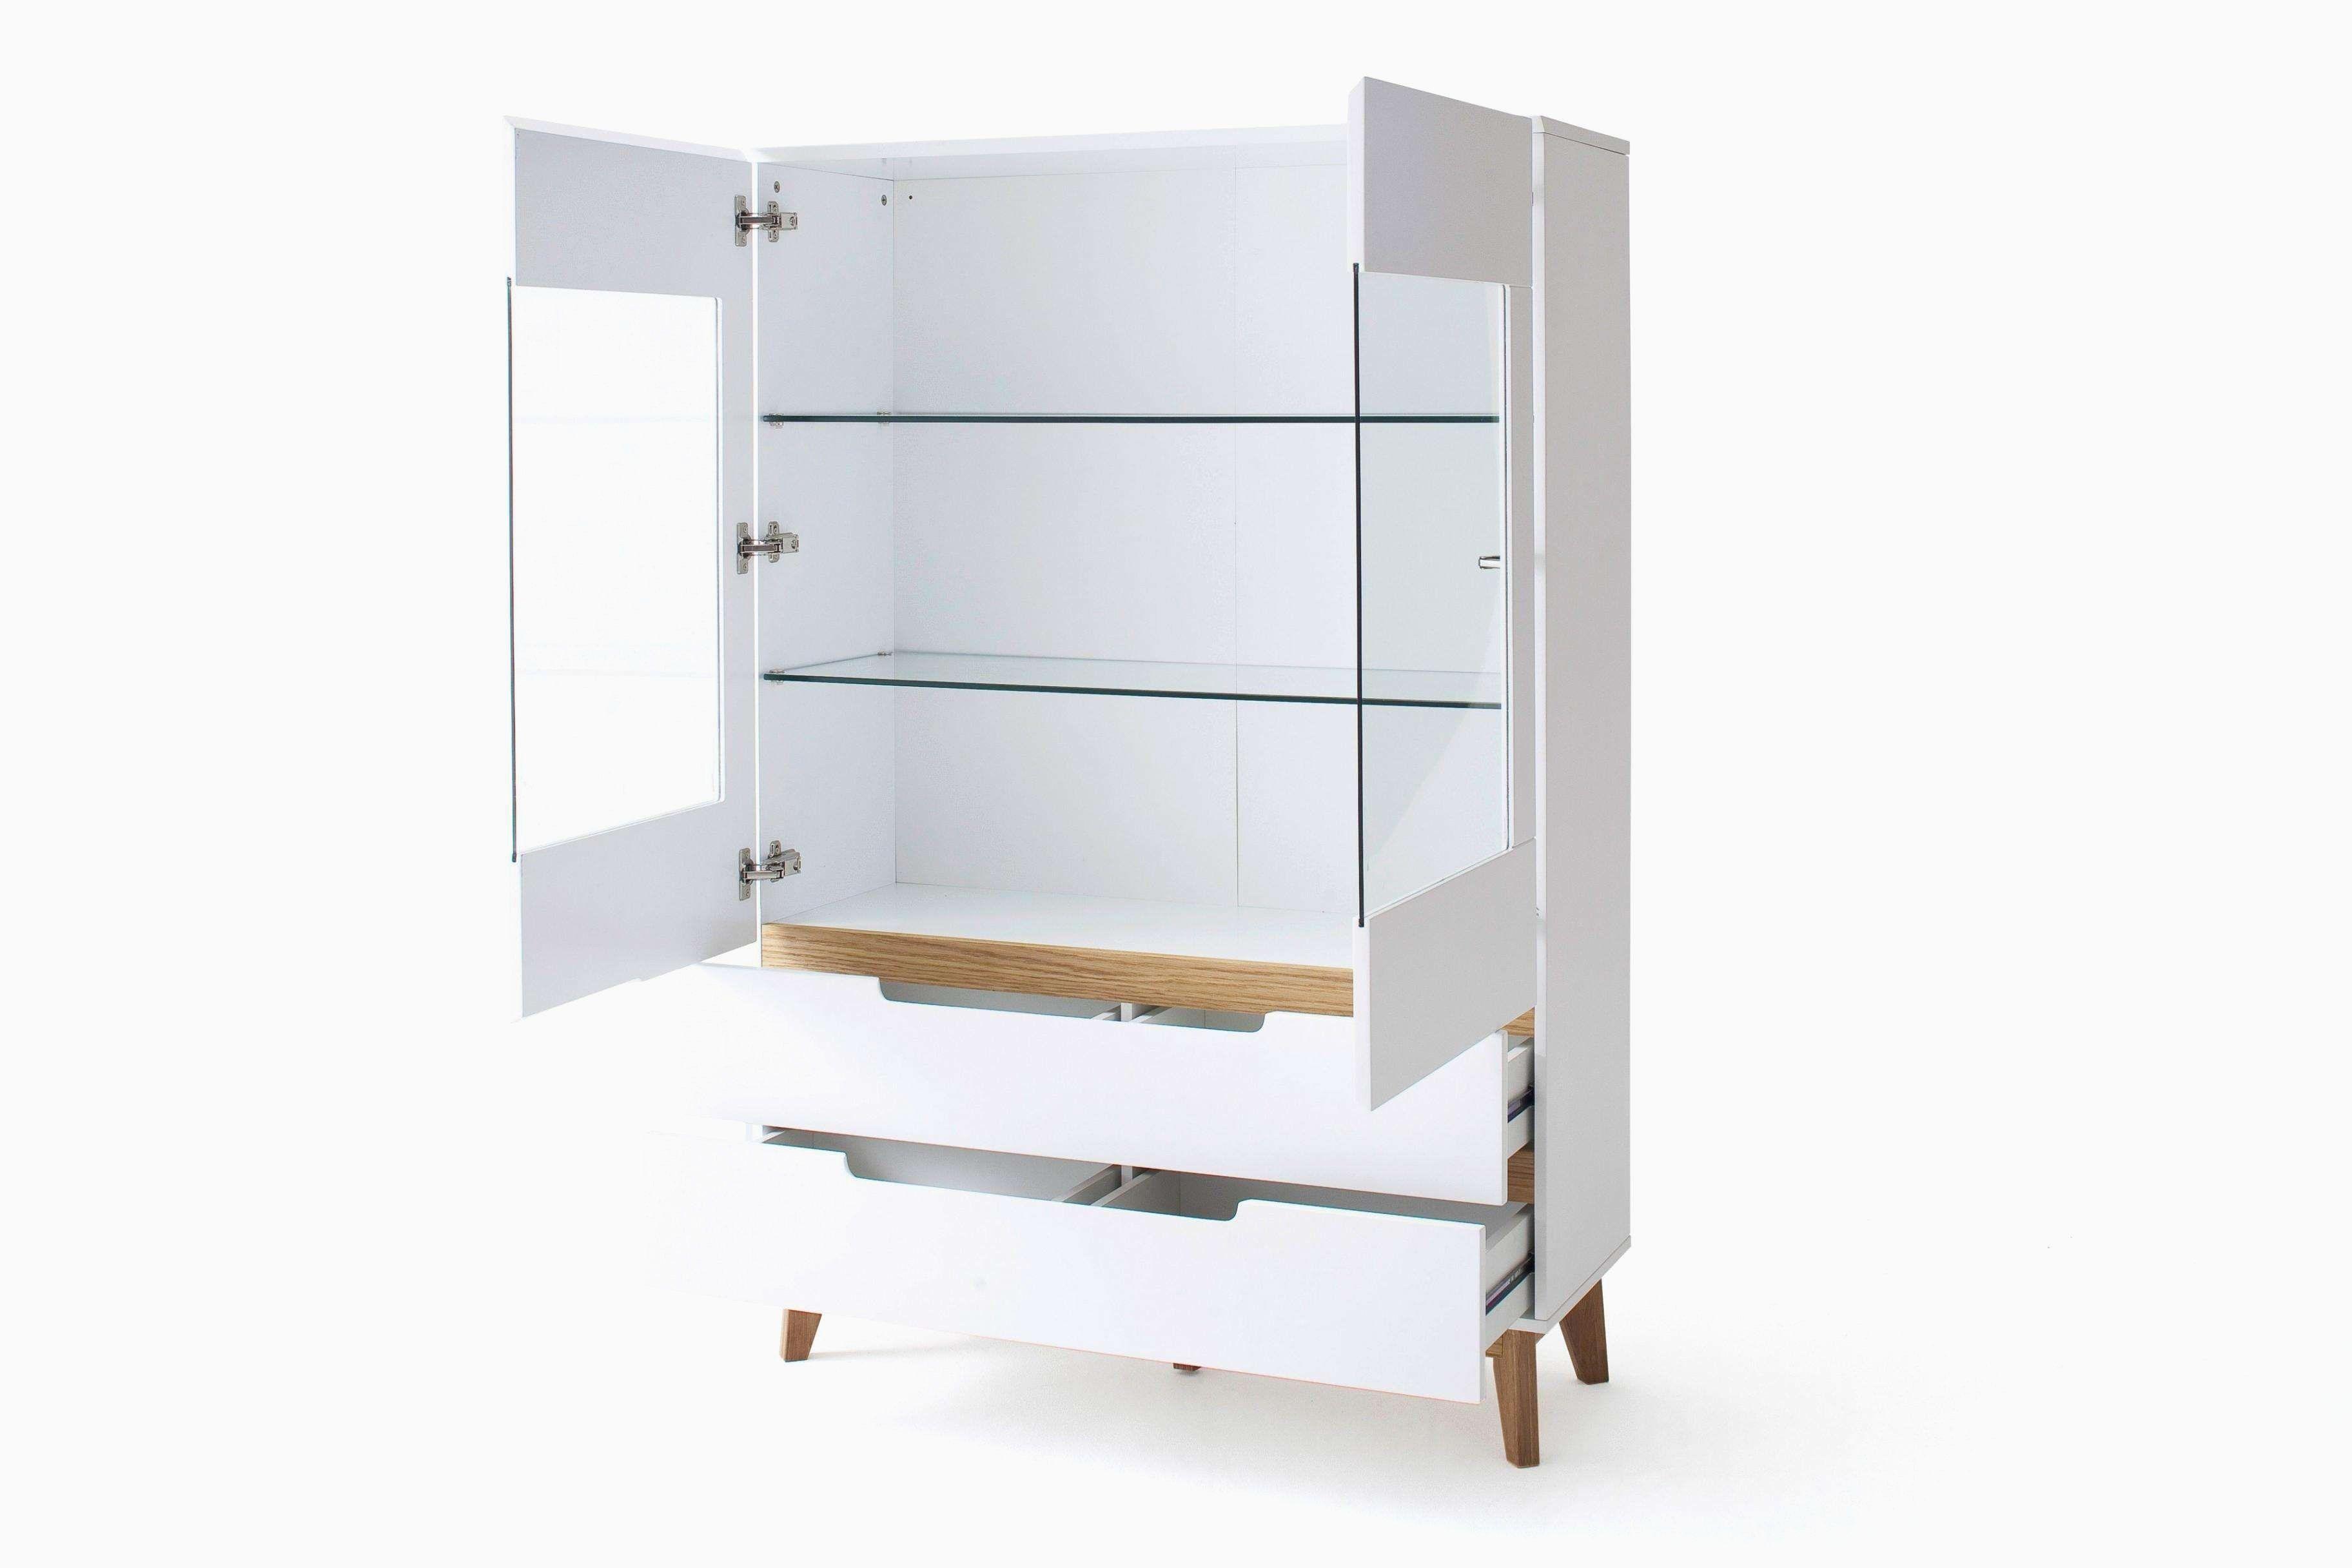 14 Badezimmerschrank Ikea Qualitat Badezimmerschrank Holz Schon Eintagamsee Badezimmerschrank Holz Ikea Badezimmerschrank Ikea